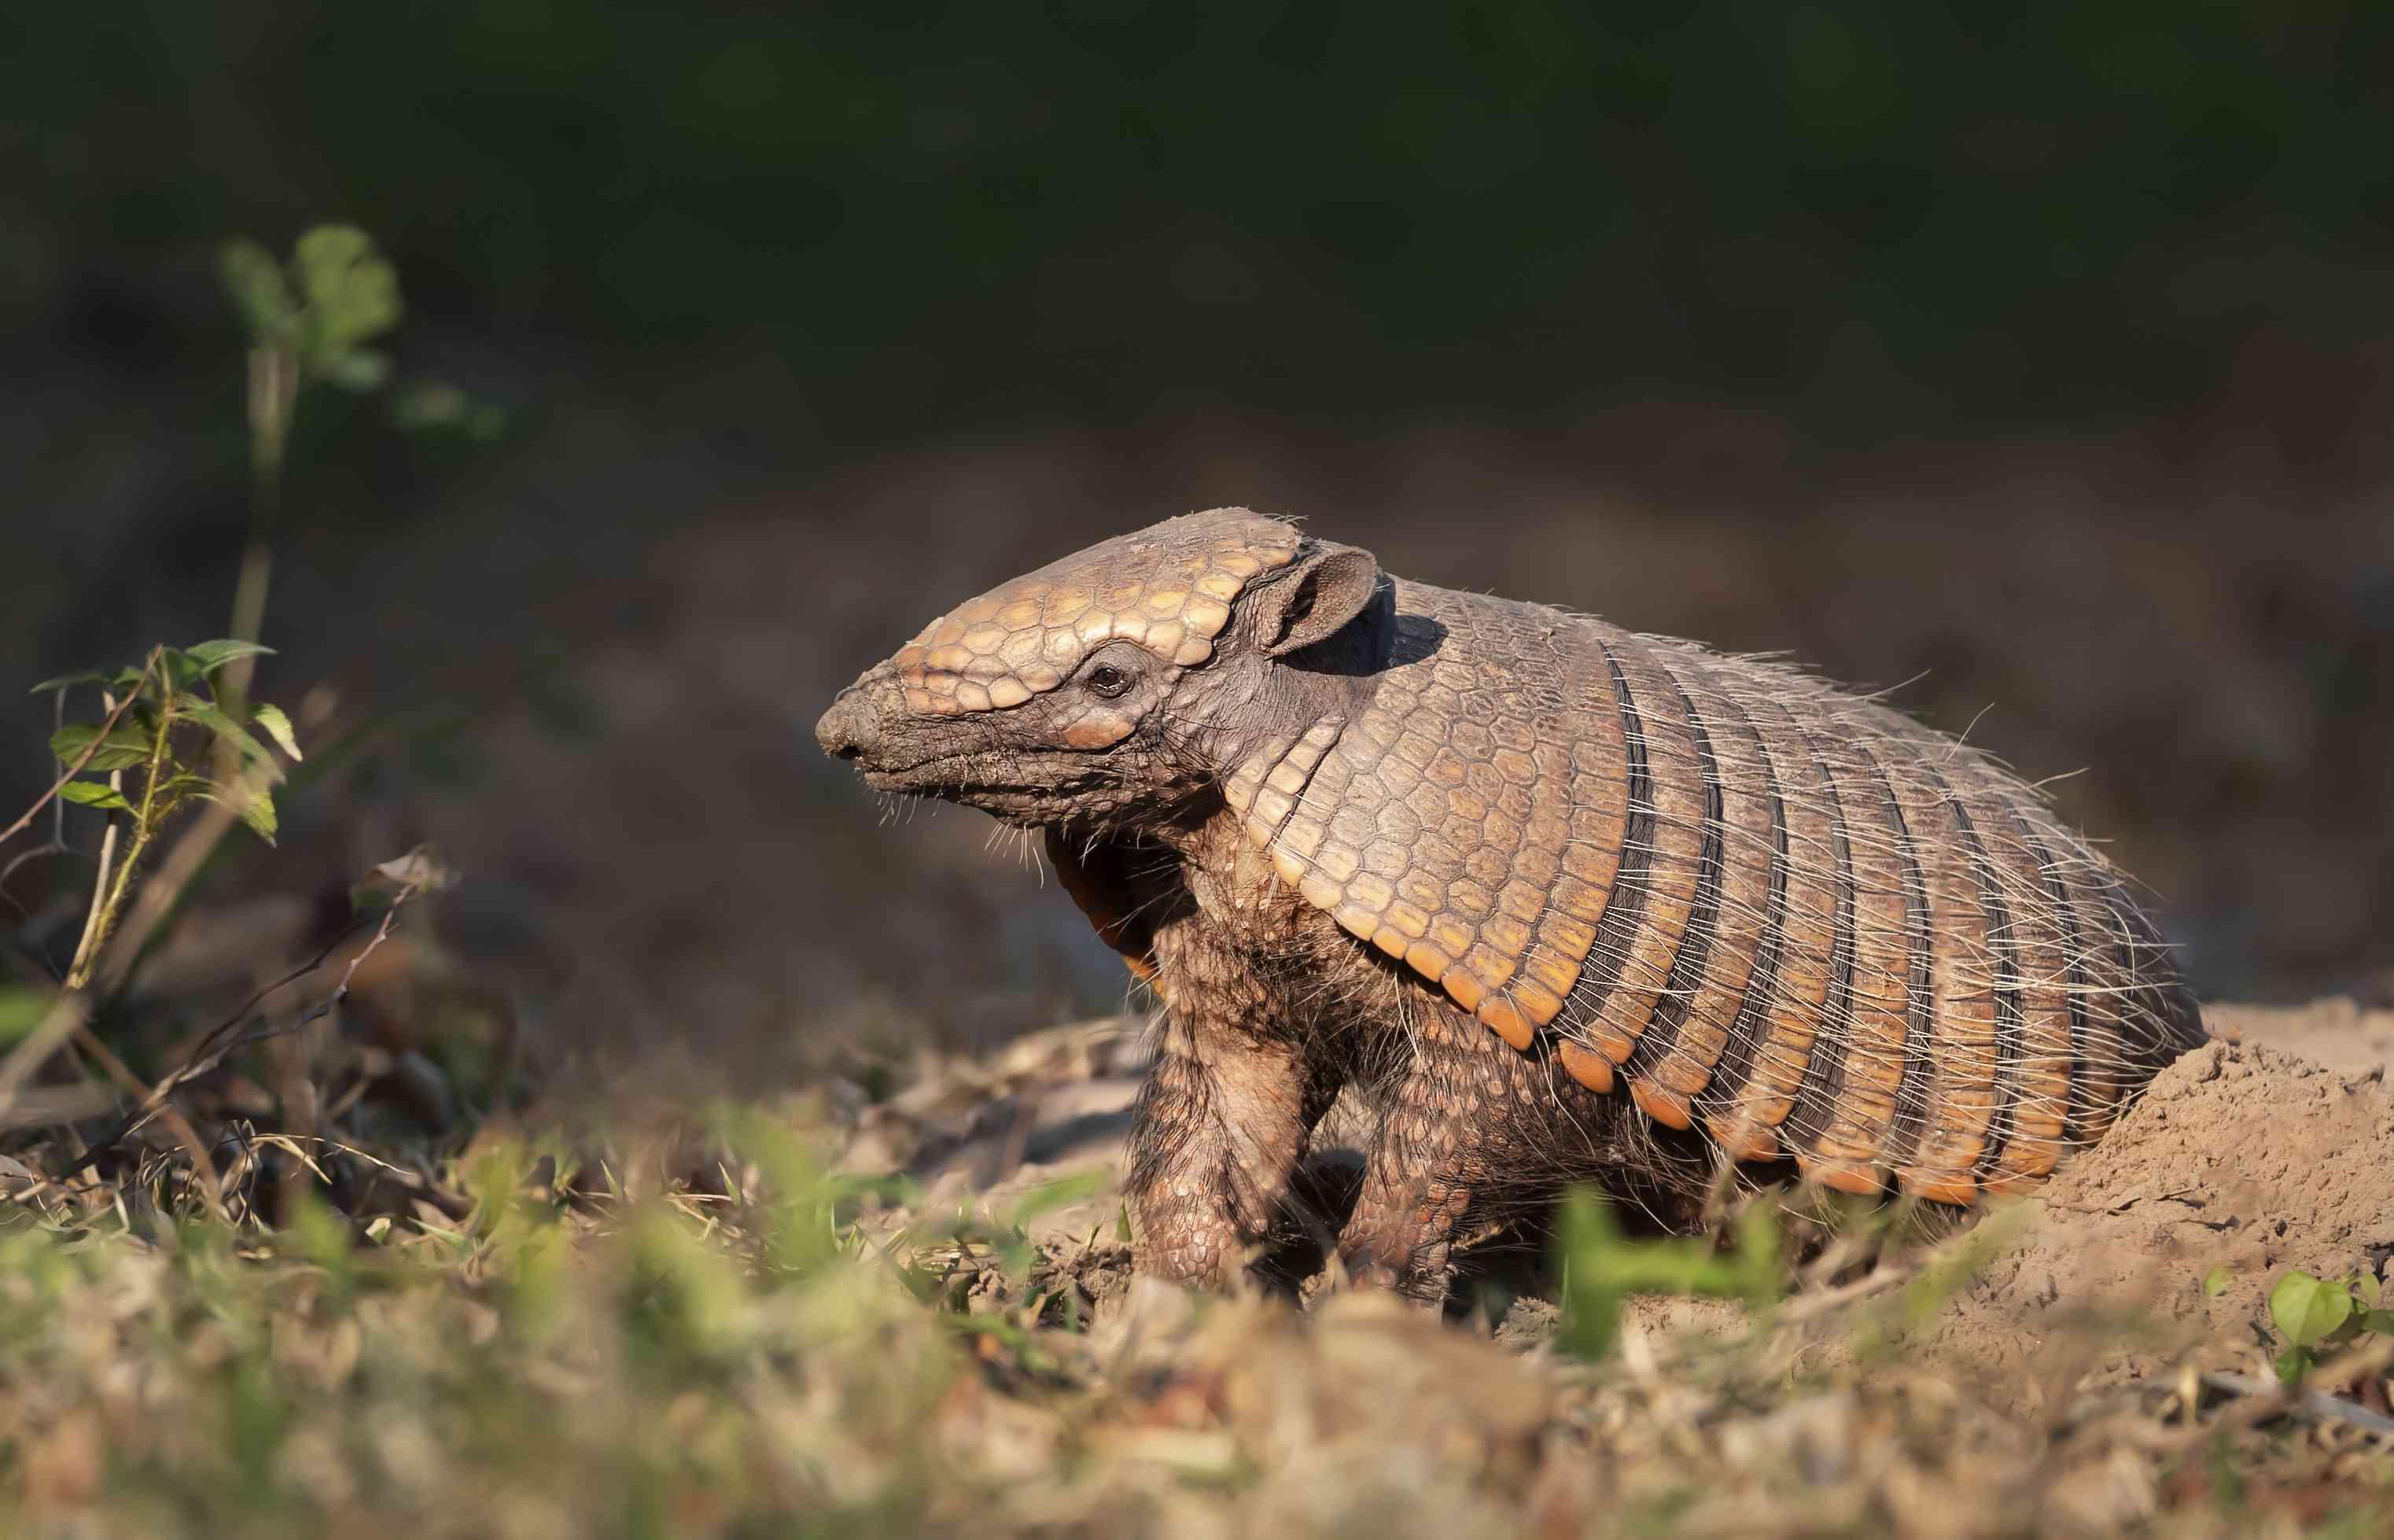 Close up of a Six-banded armadillo (Euphractus sexcinctus) standing next to its burrow, South Pantanal, Brazil